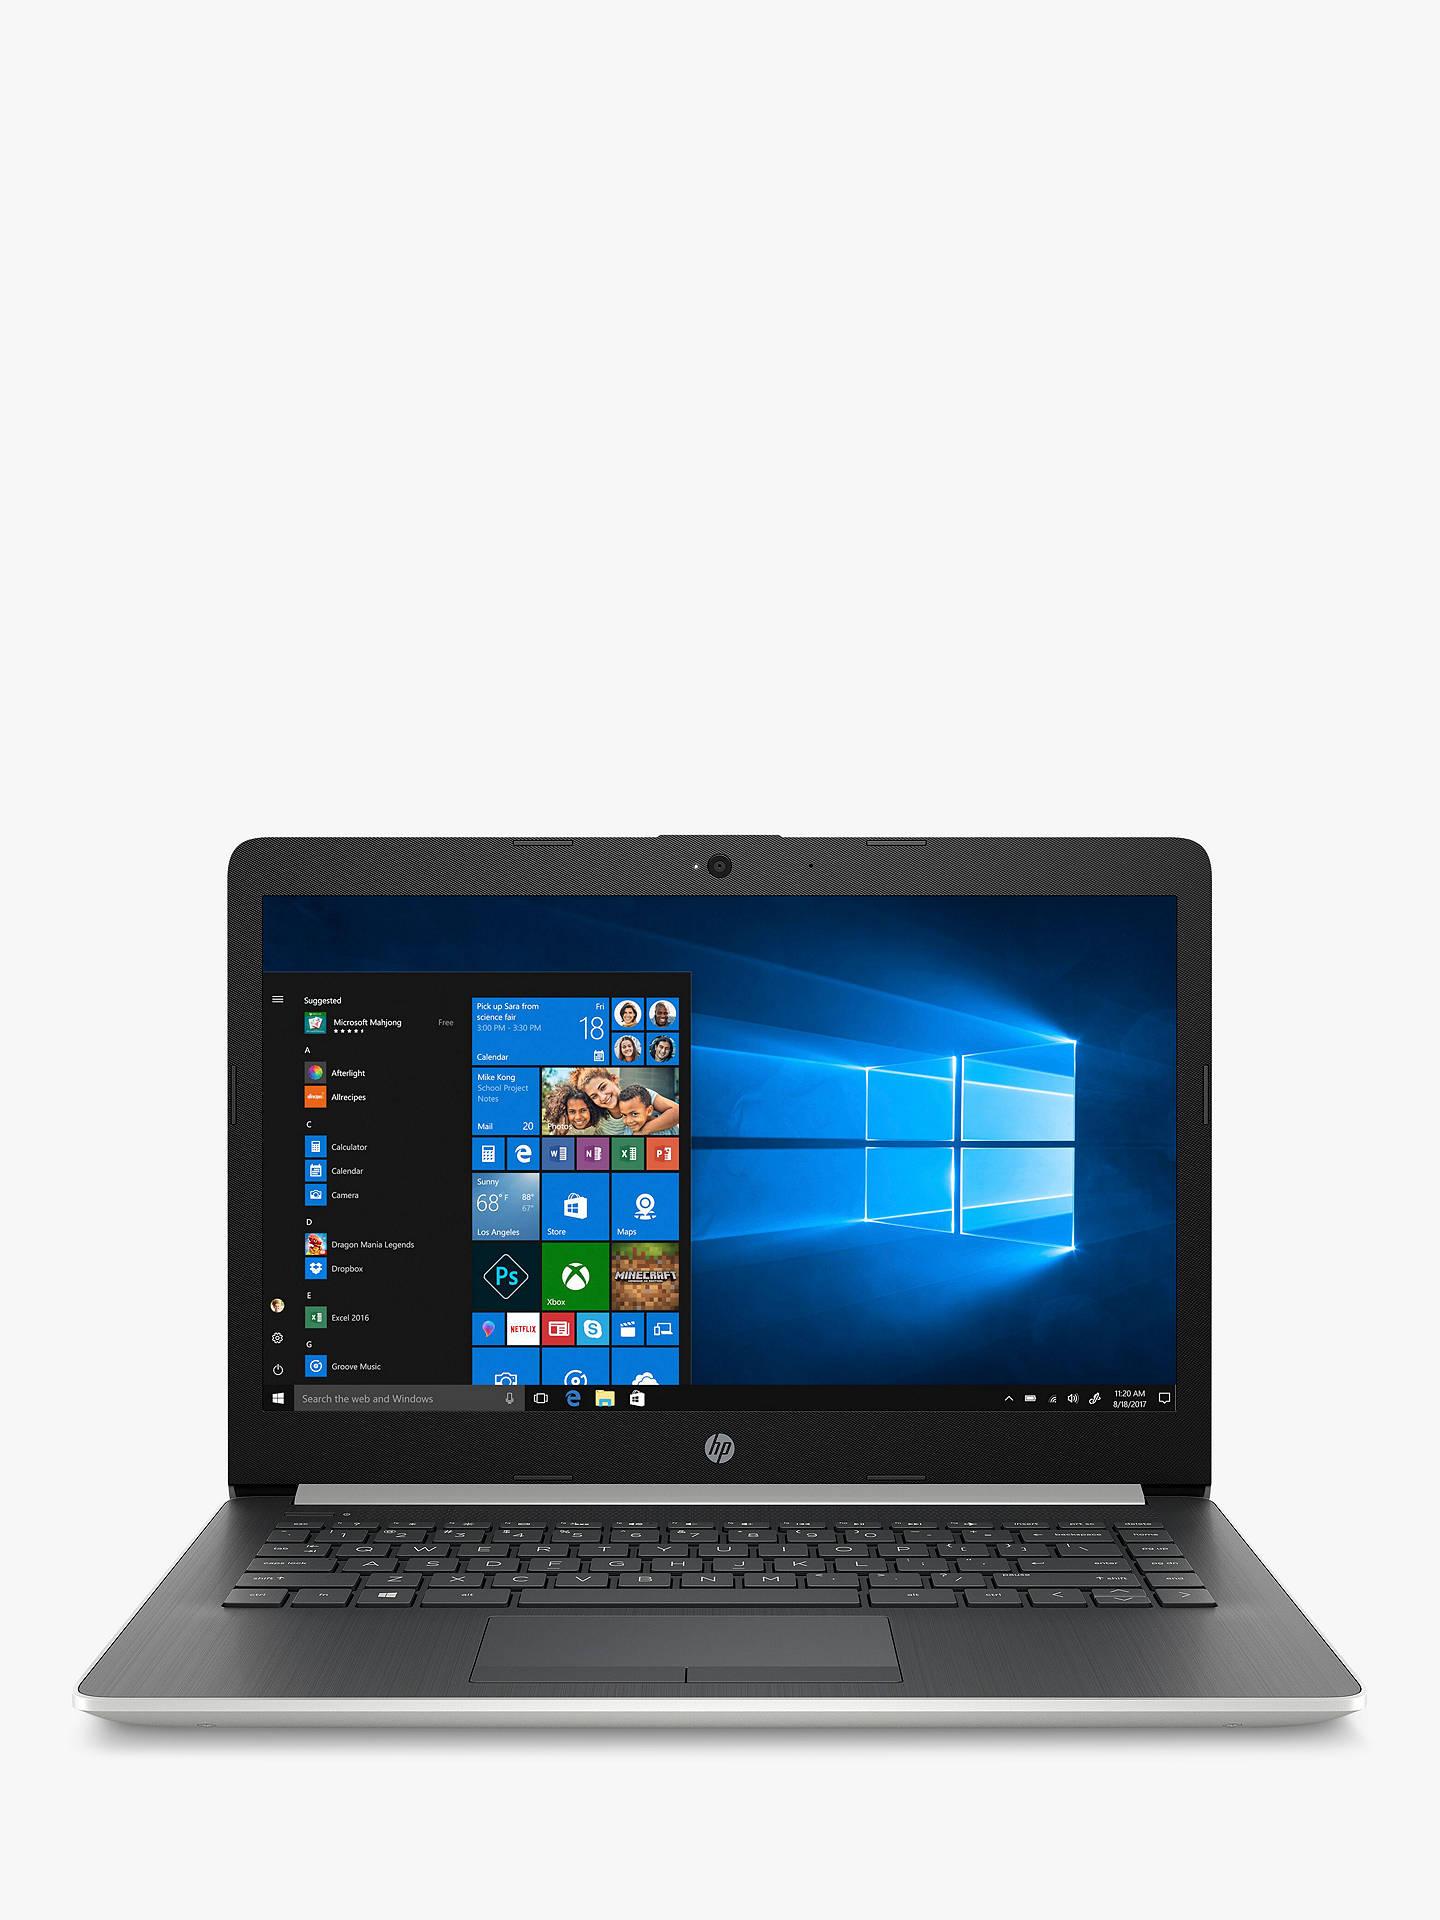 "HP Laptop, Ryzen 3 with Vega3 graphics, 4GB RAM, 128GB SSD, 14"" IPS - £299.95 at John Lewis and Partners"